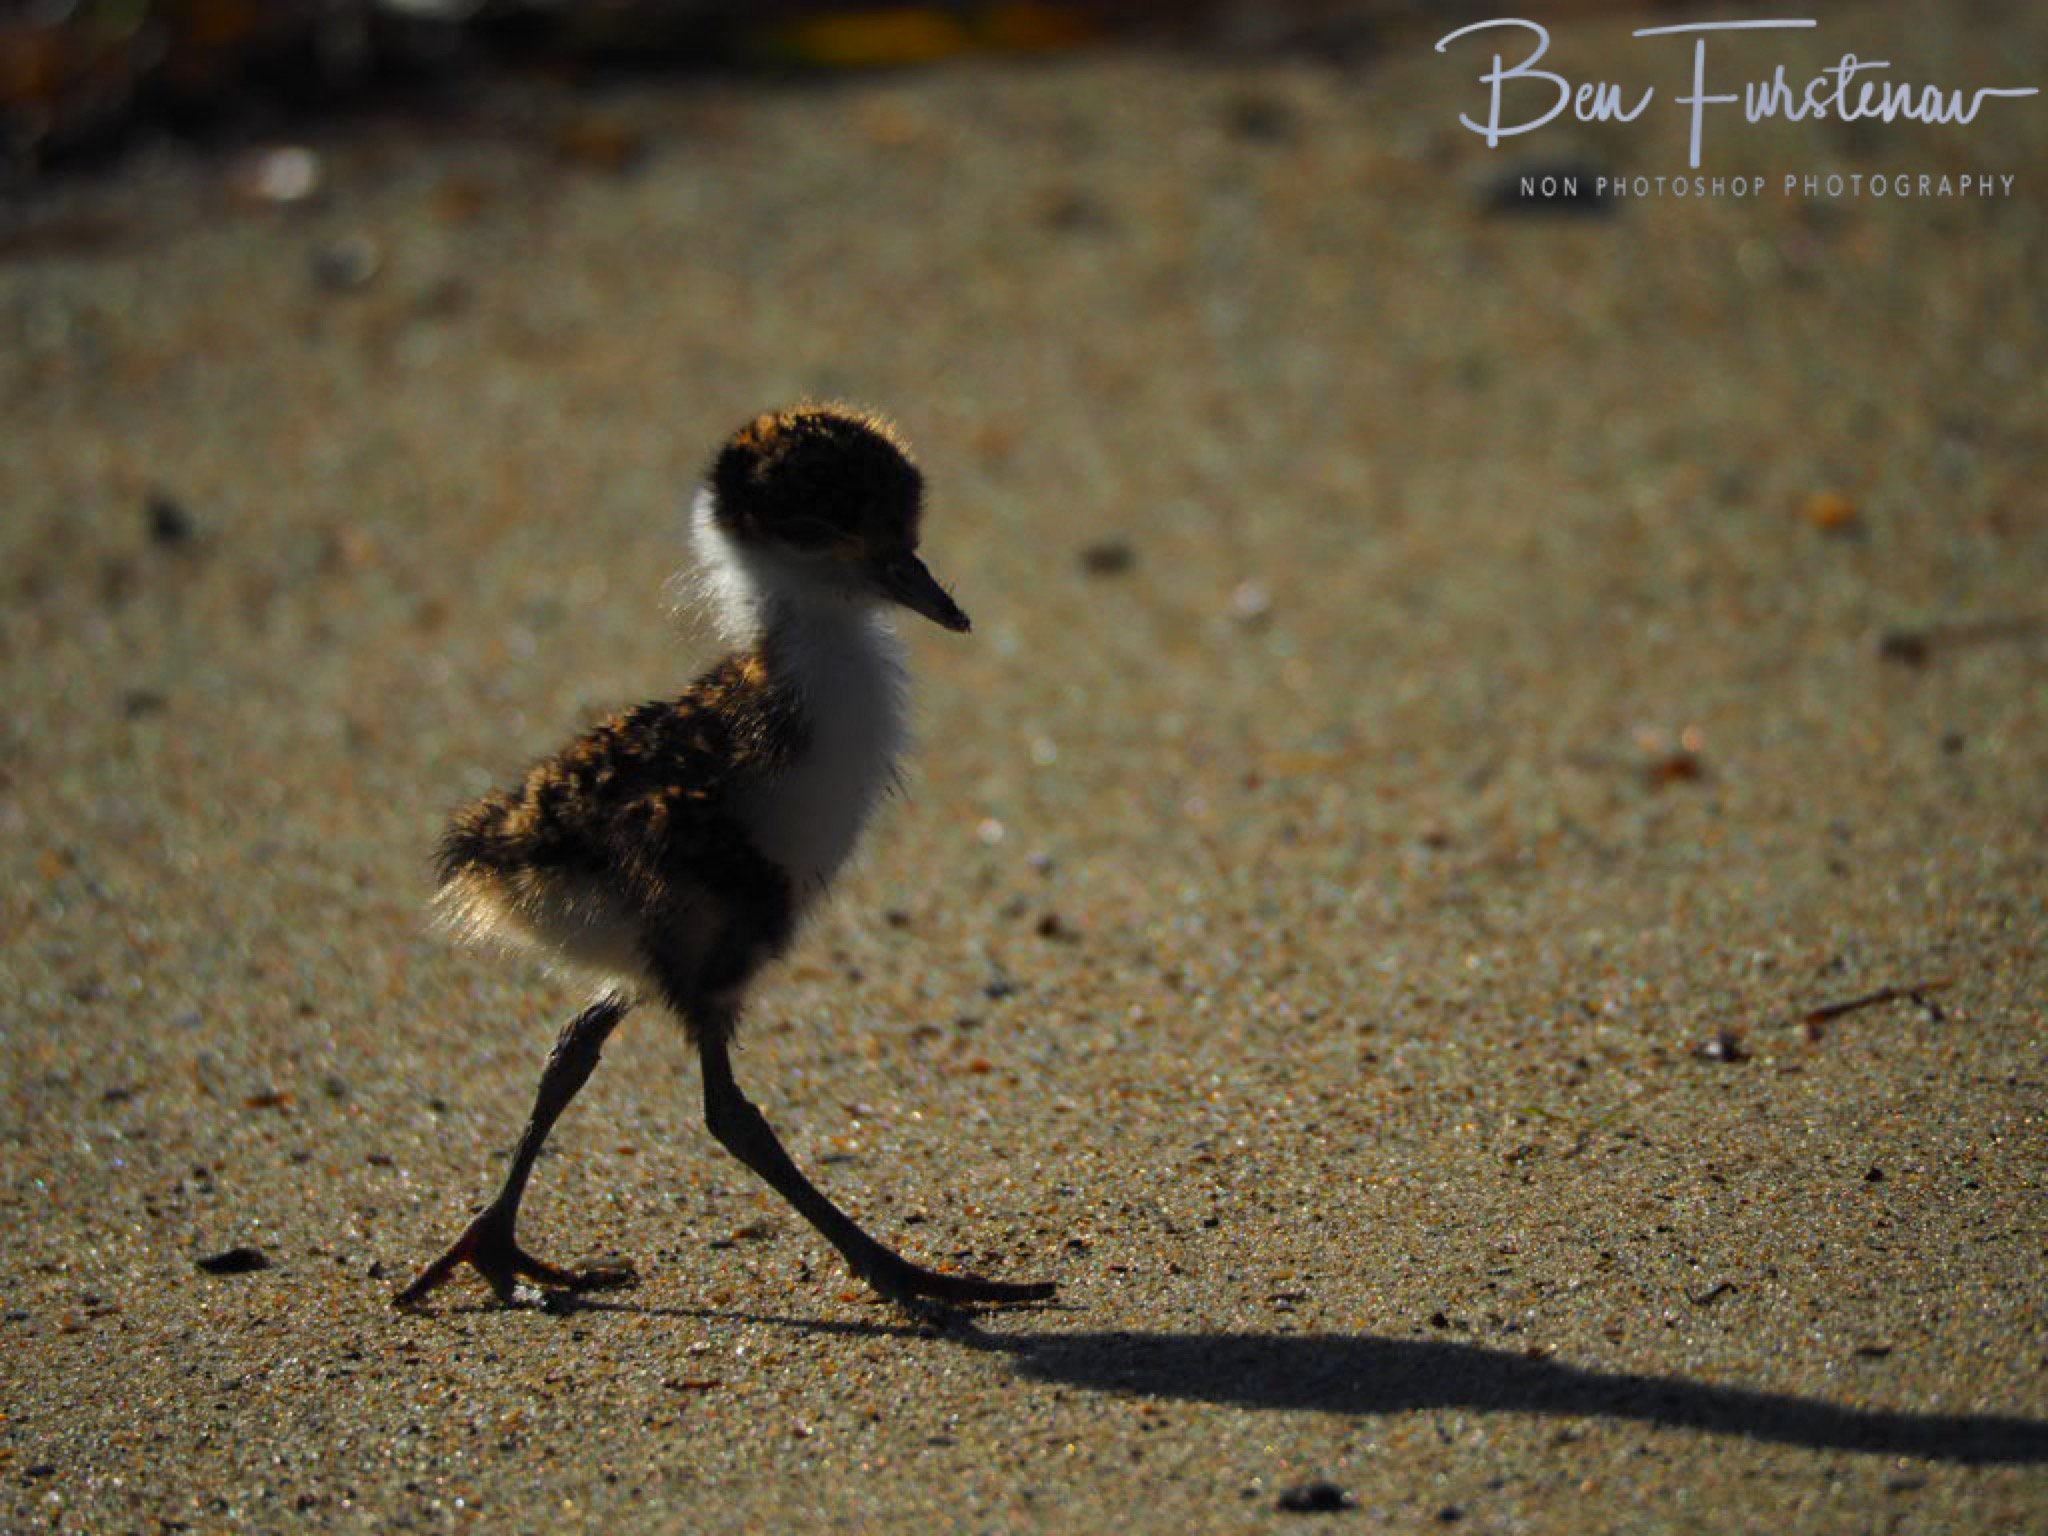 Beach stroll @ Deception Bay, South-East Queensland, Australia